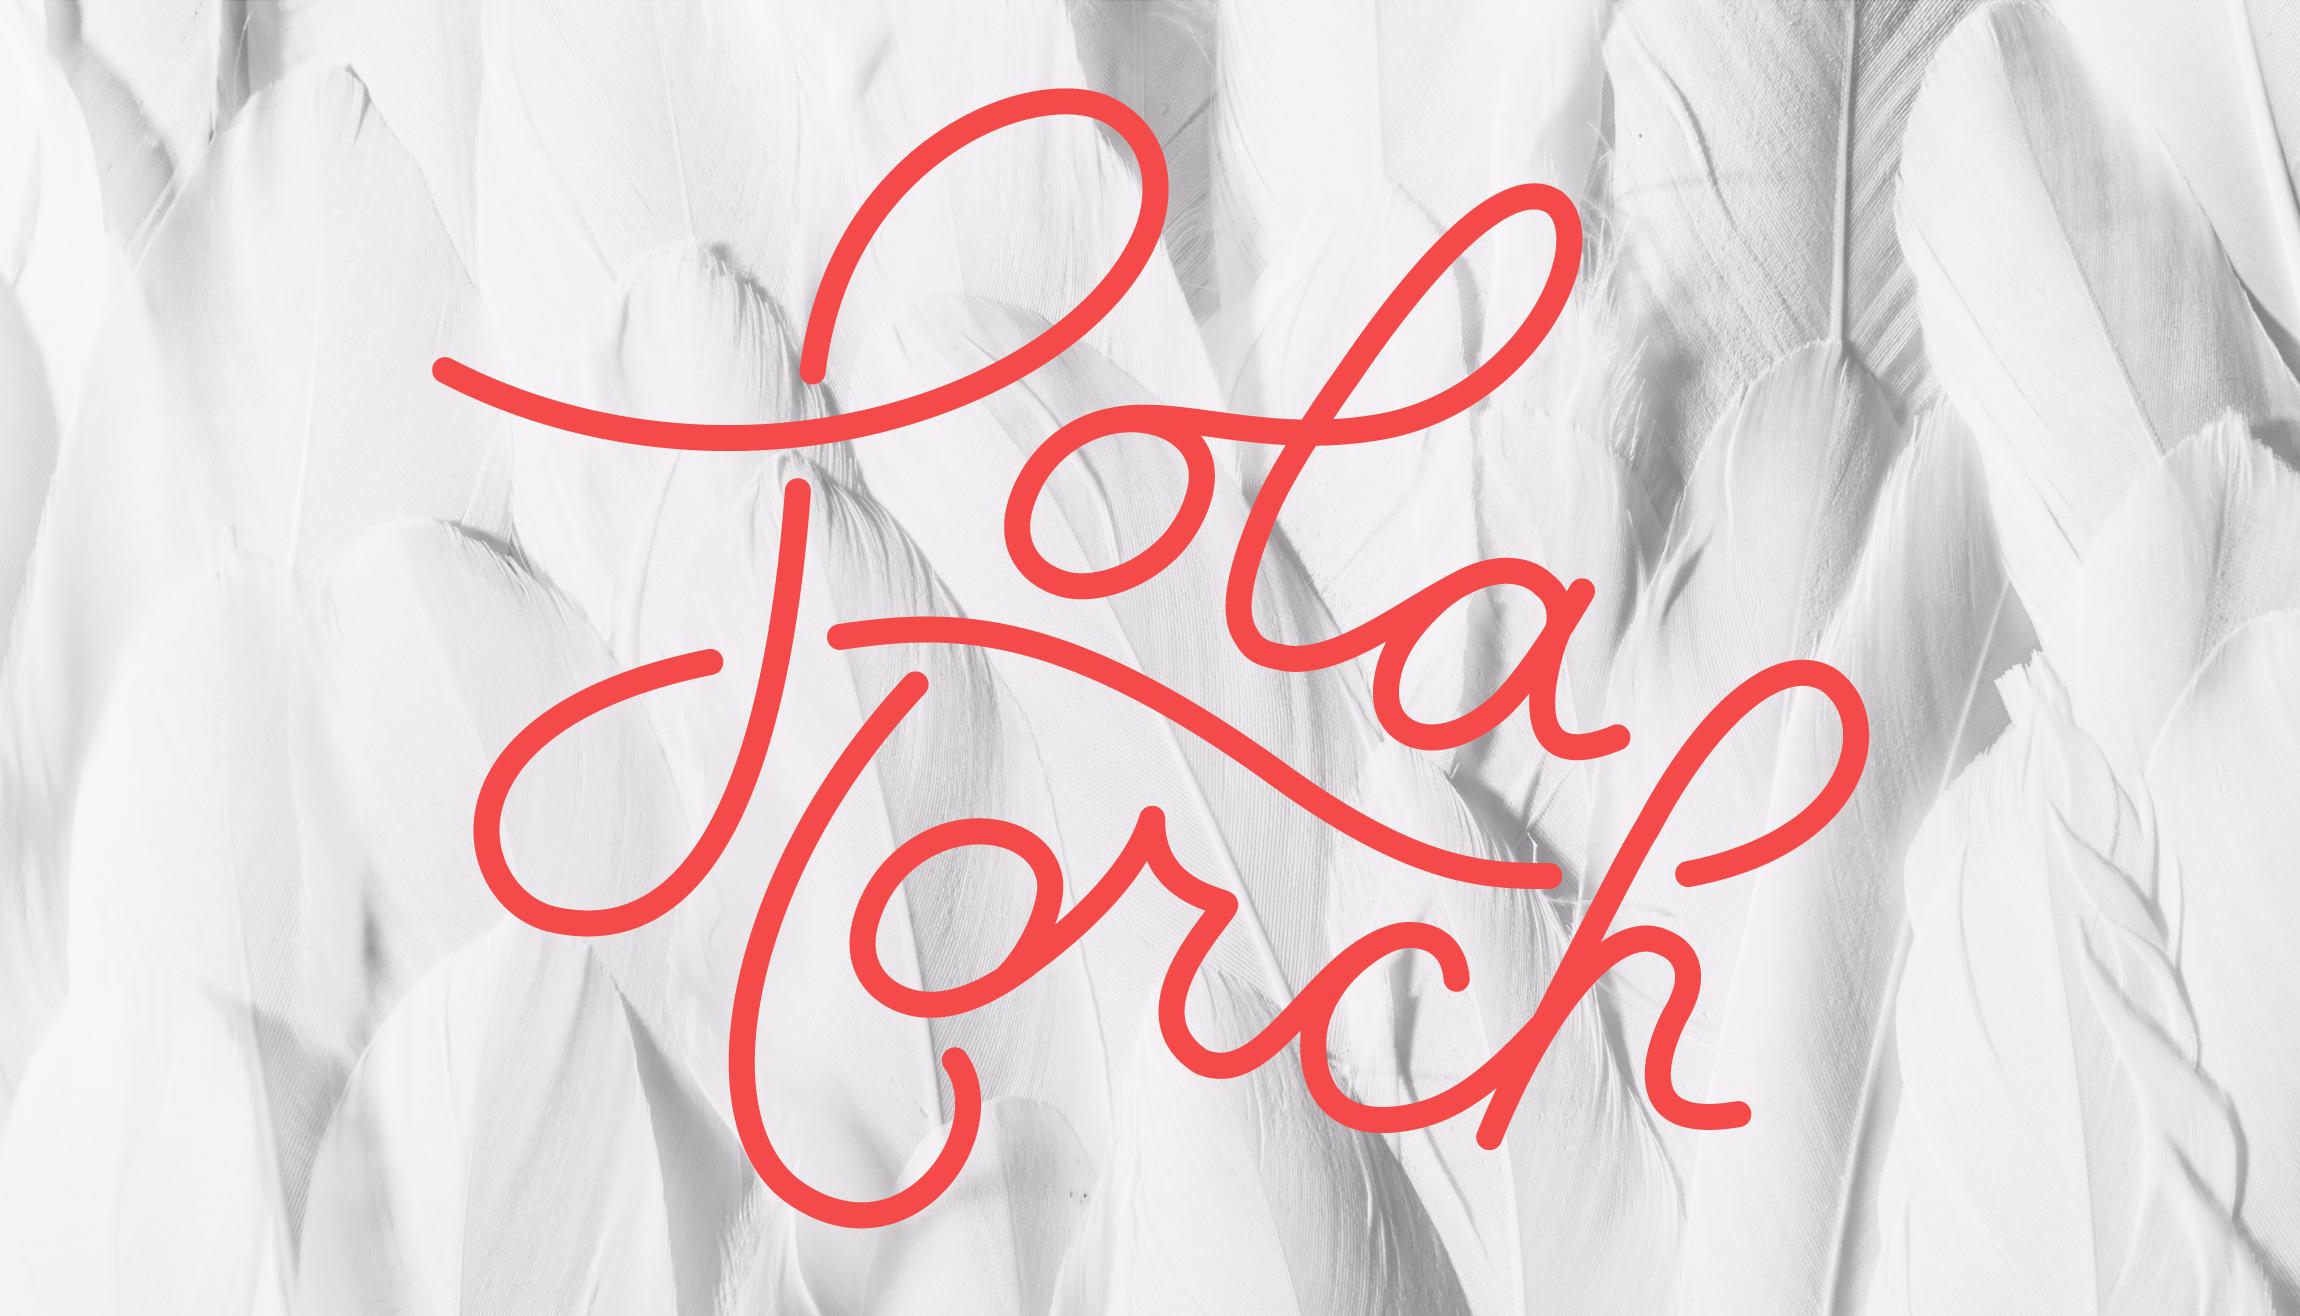 Lola-Torch_header2.png